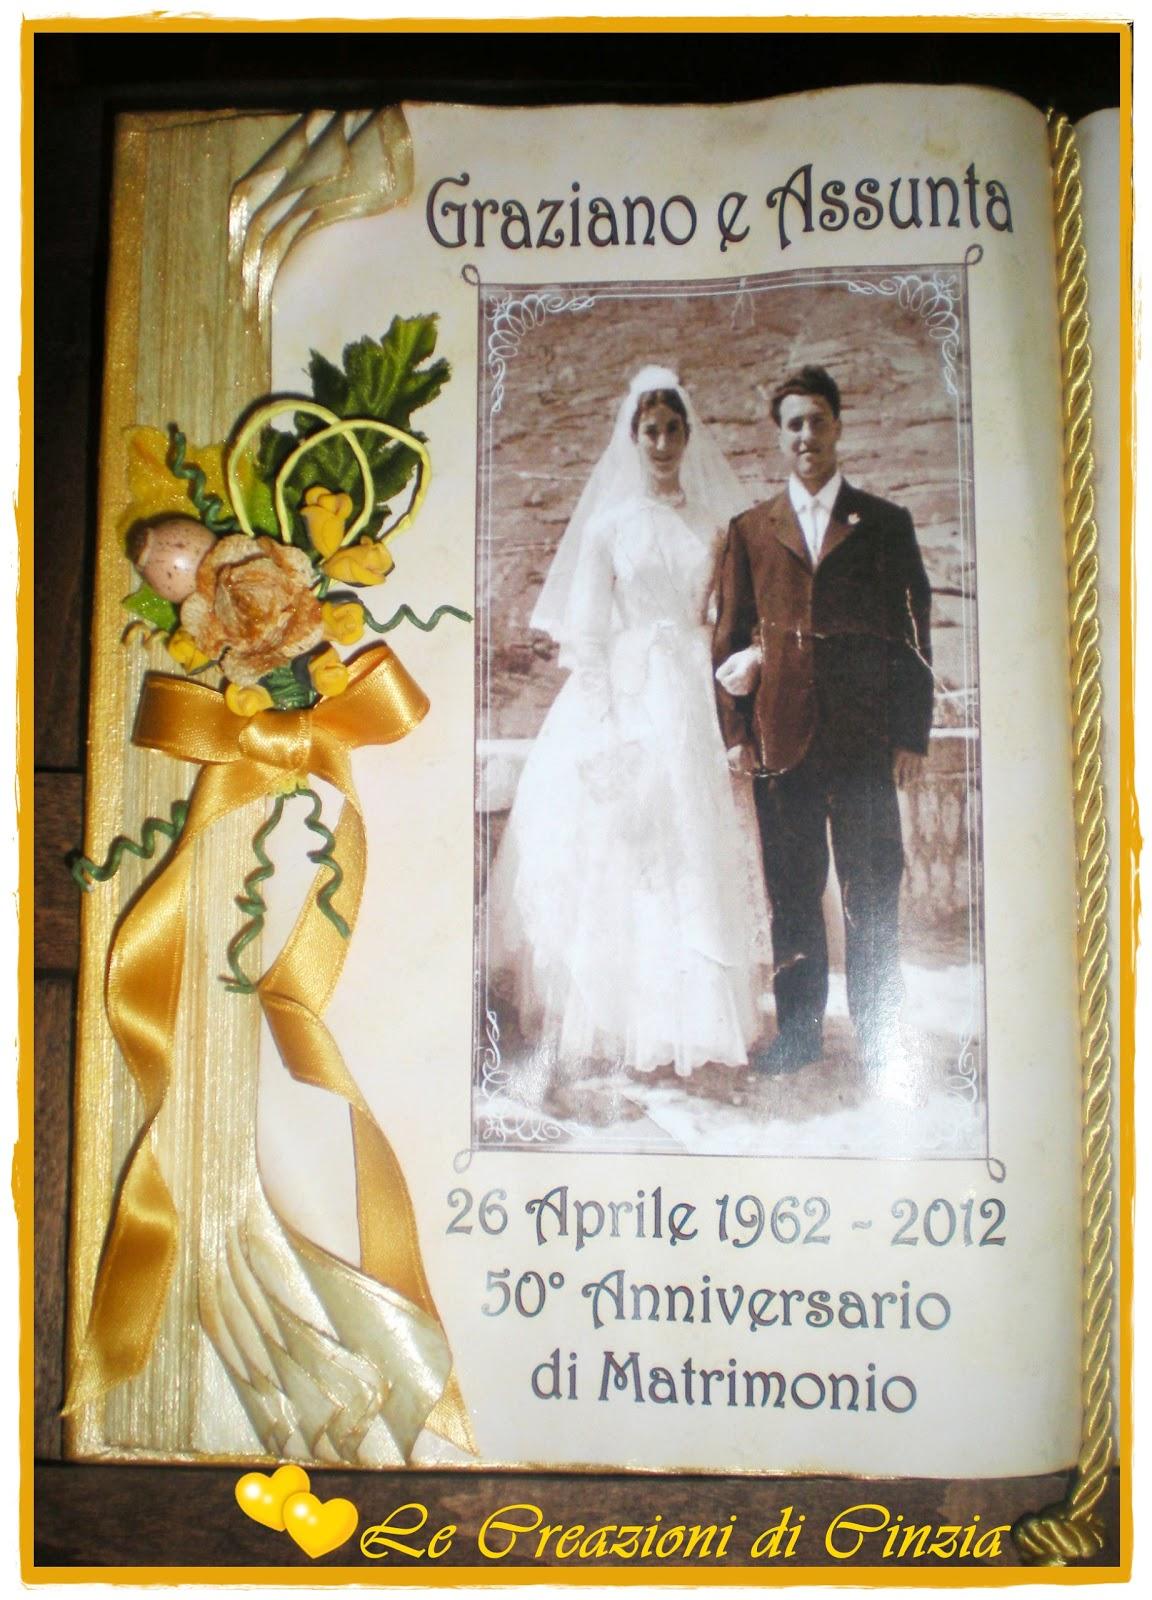 regalo anniversario 50 anno matrimonio